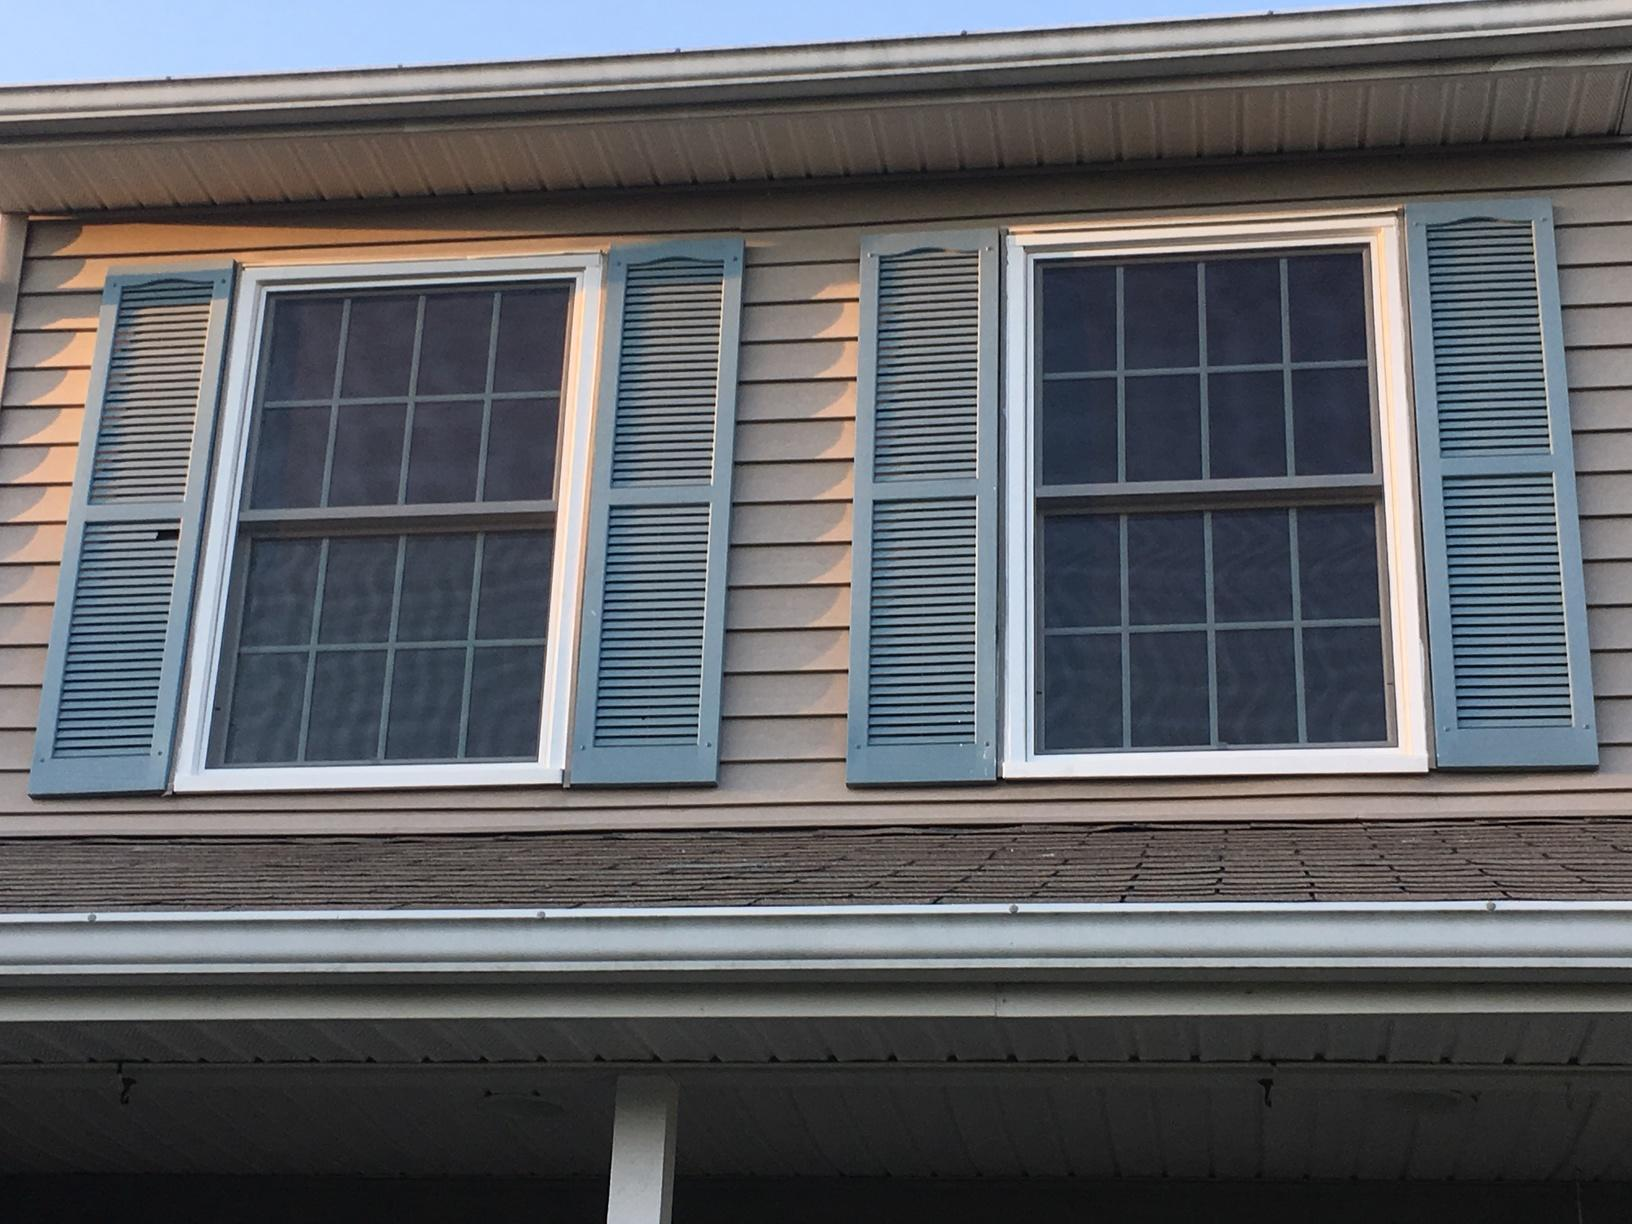 Marvin Infinity Window Replacement in NJ